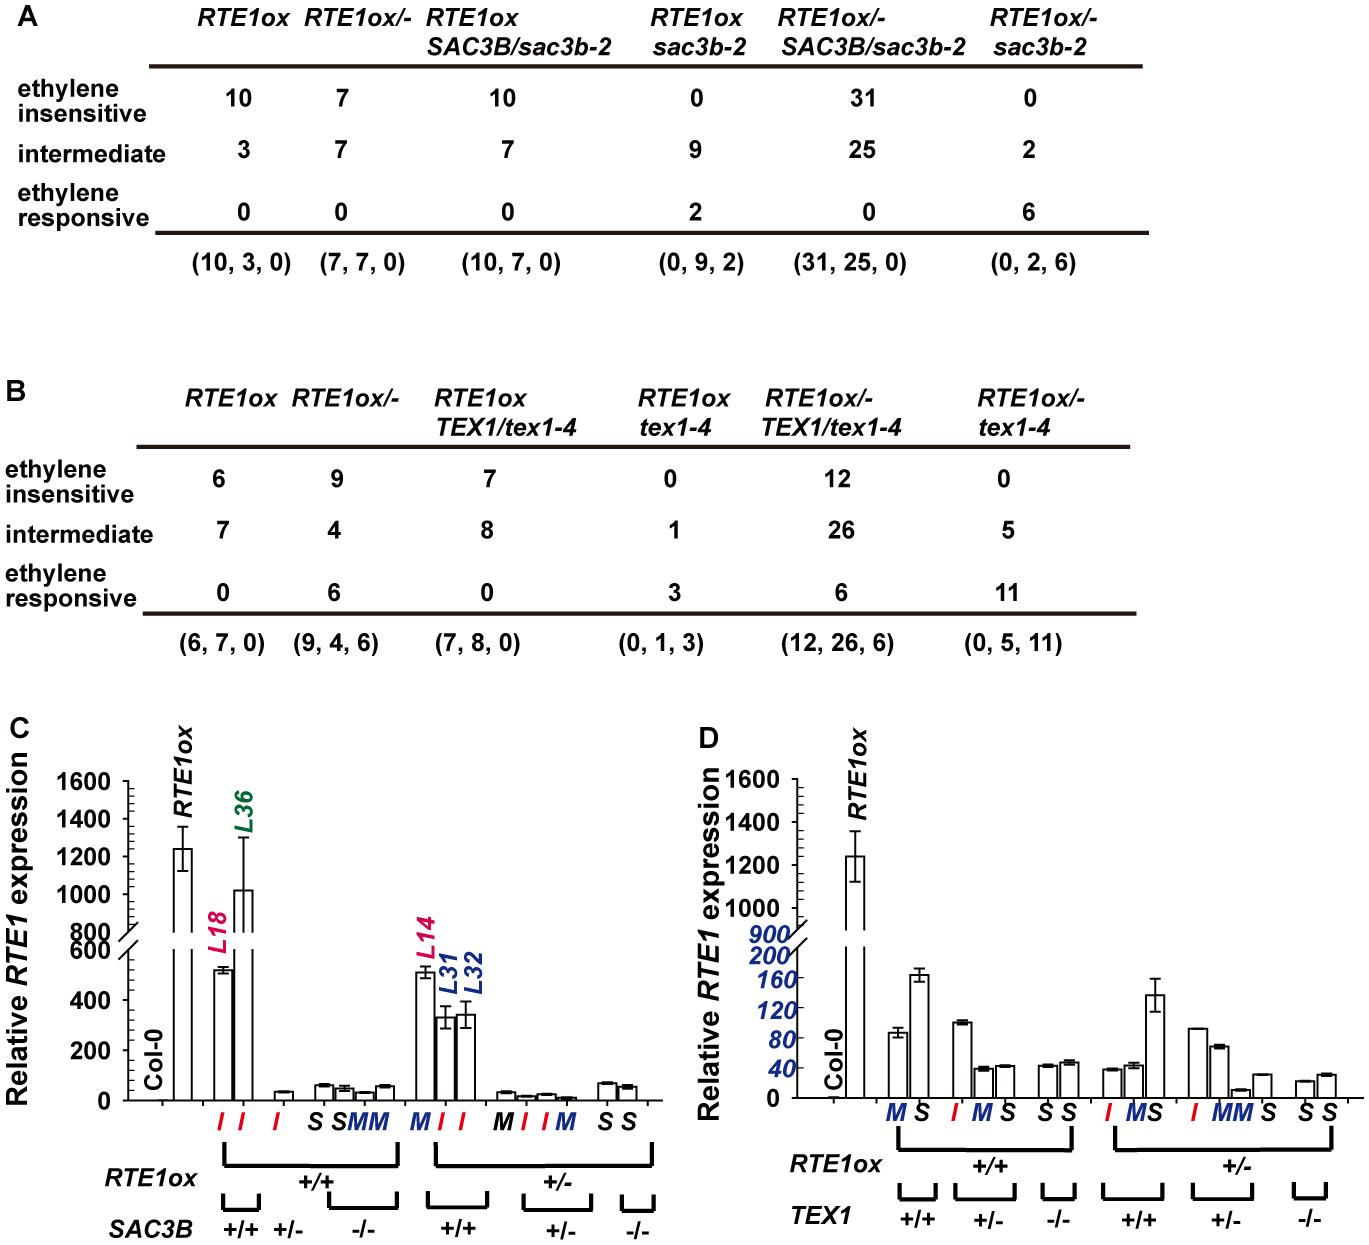 Analyses for the ethylene response phenotype and <i>RTE1</i> expression in <i>35S:RTE1</i>-containing individuals.